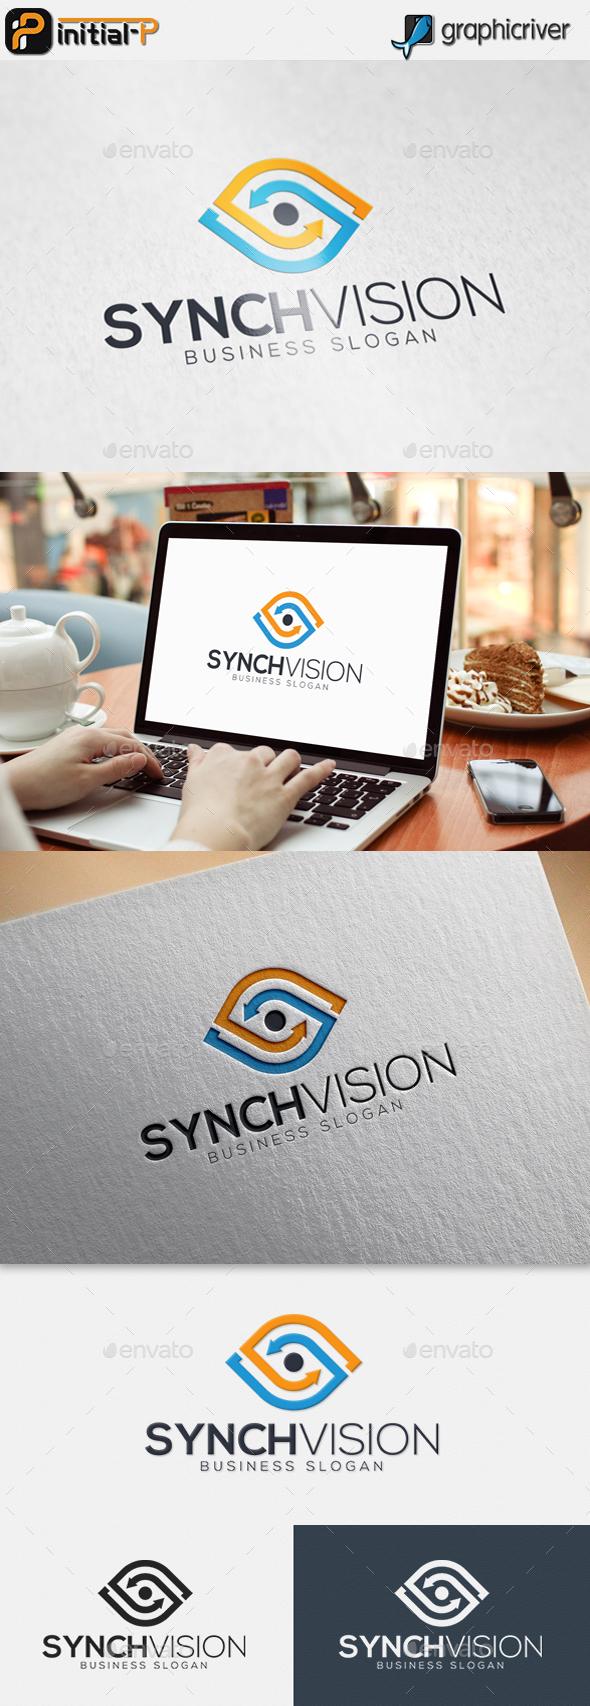 Synch Vision - Eye Logo - Vector Abstract